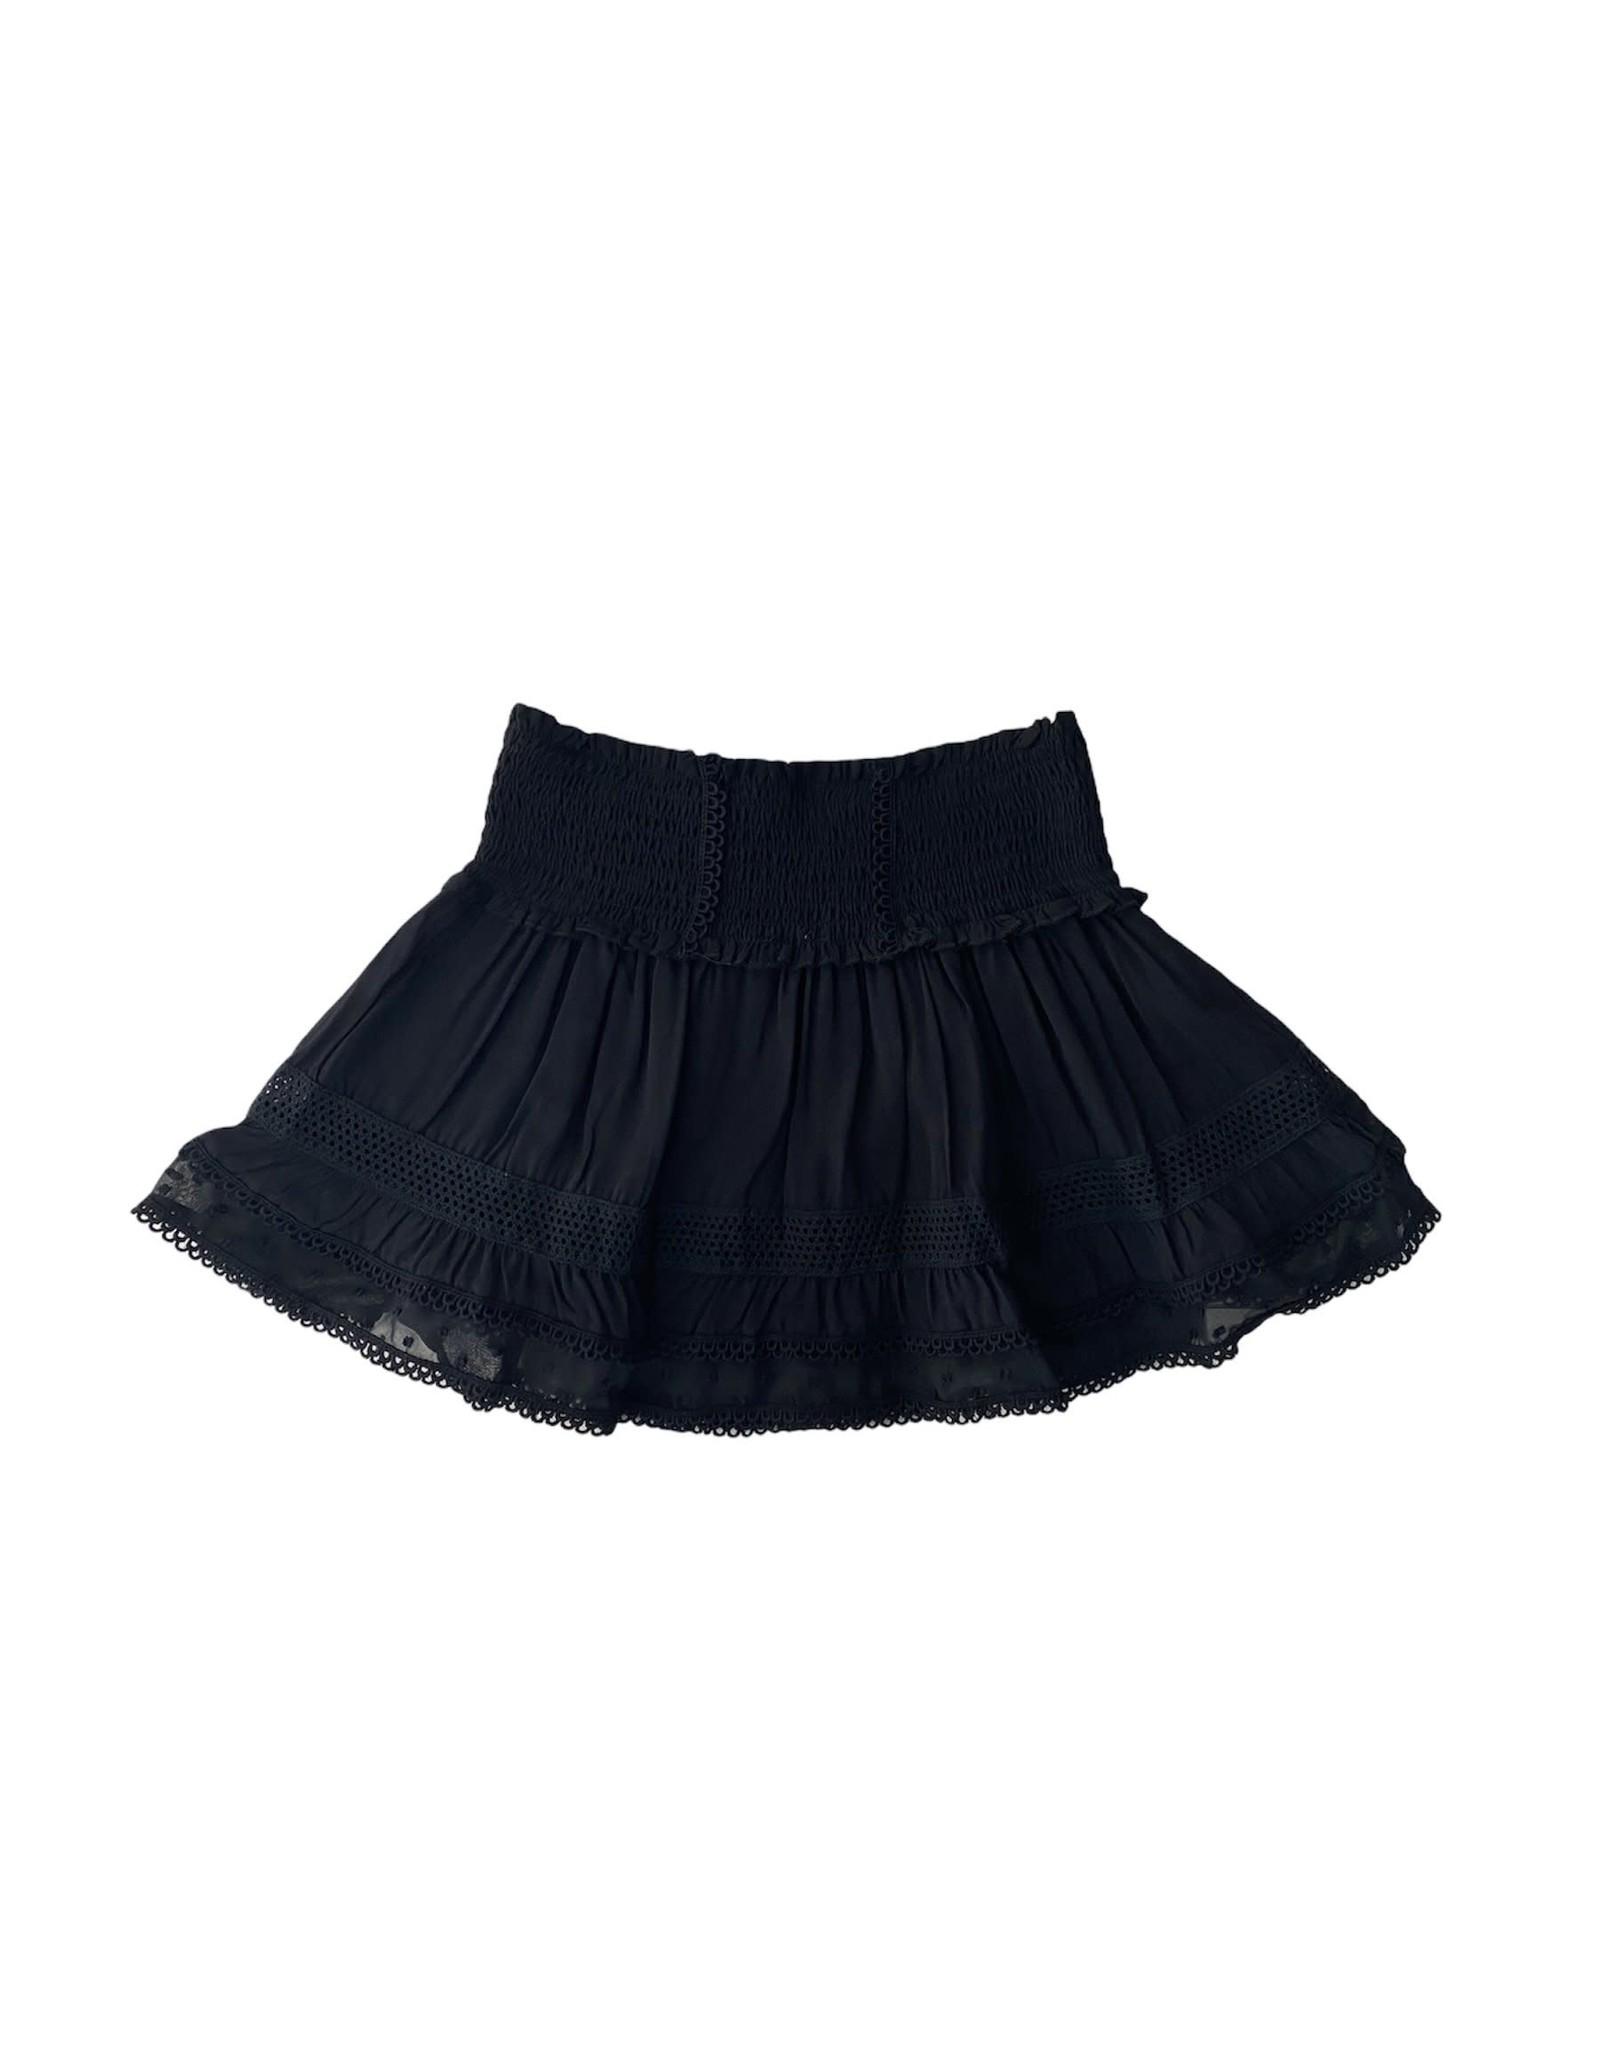 KATIEJNYC KatieJ Lara Skirt Girls